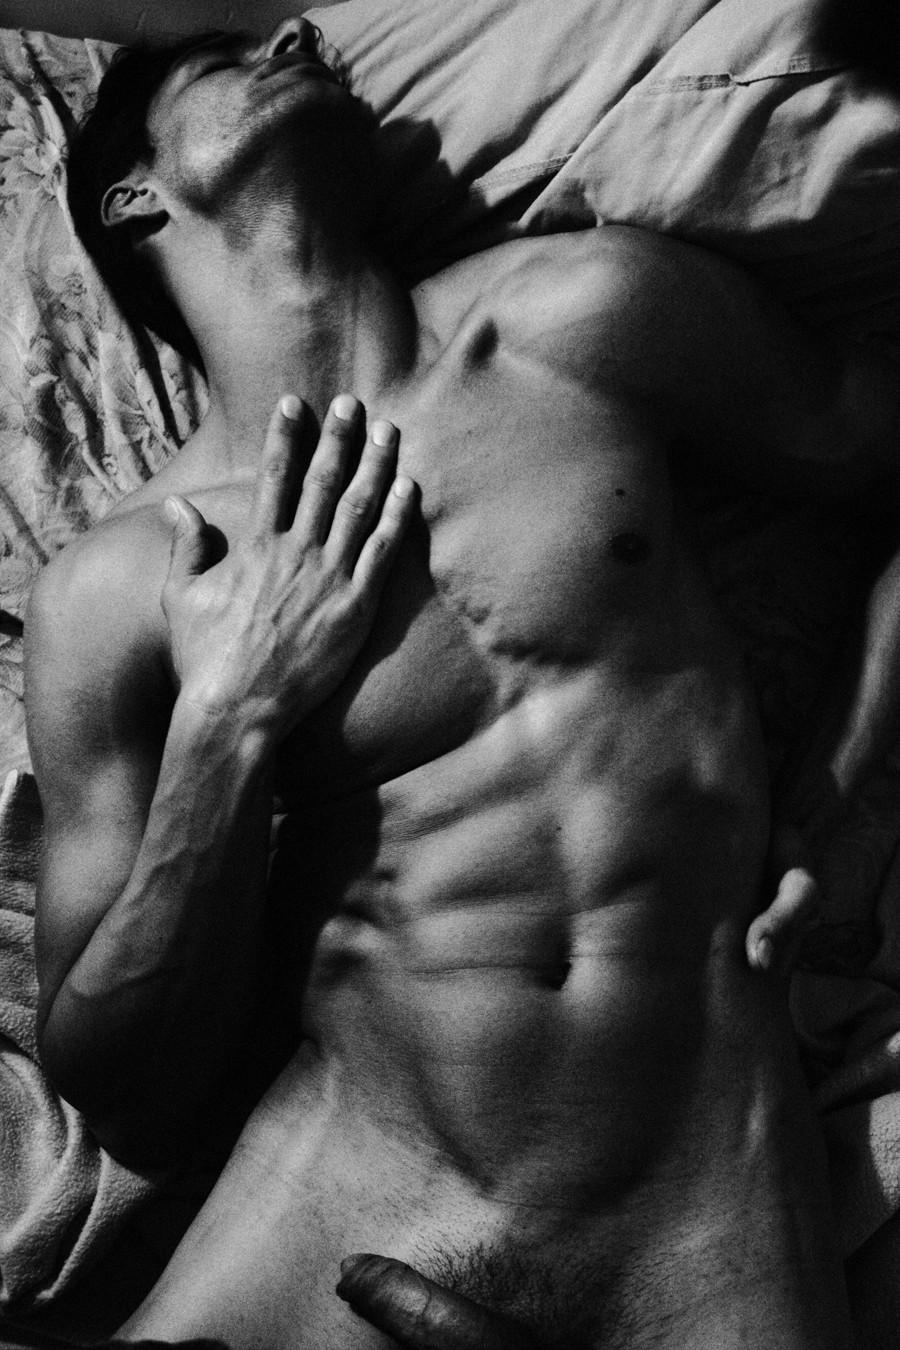 Эротика фото мужская 21 фотография